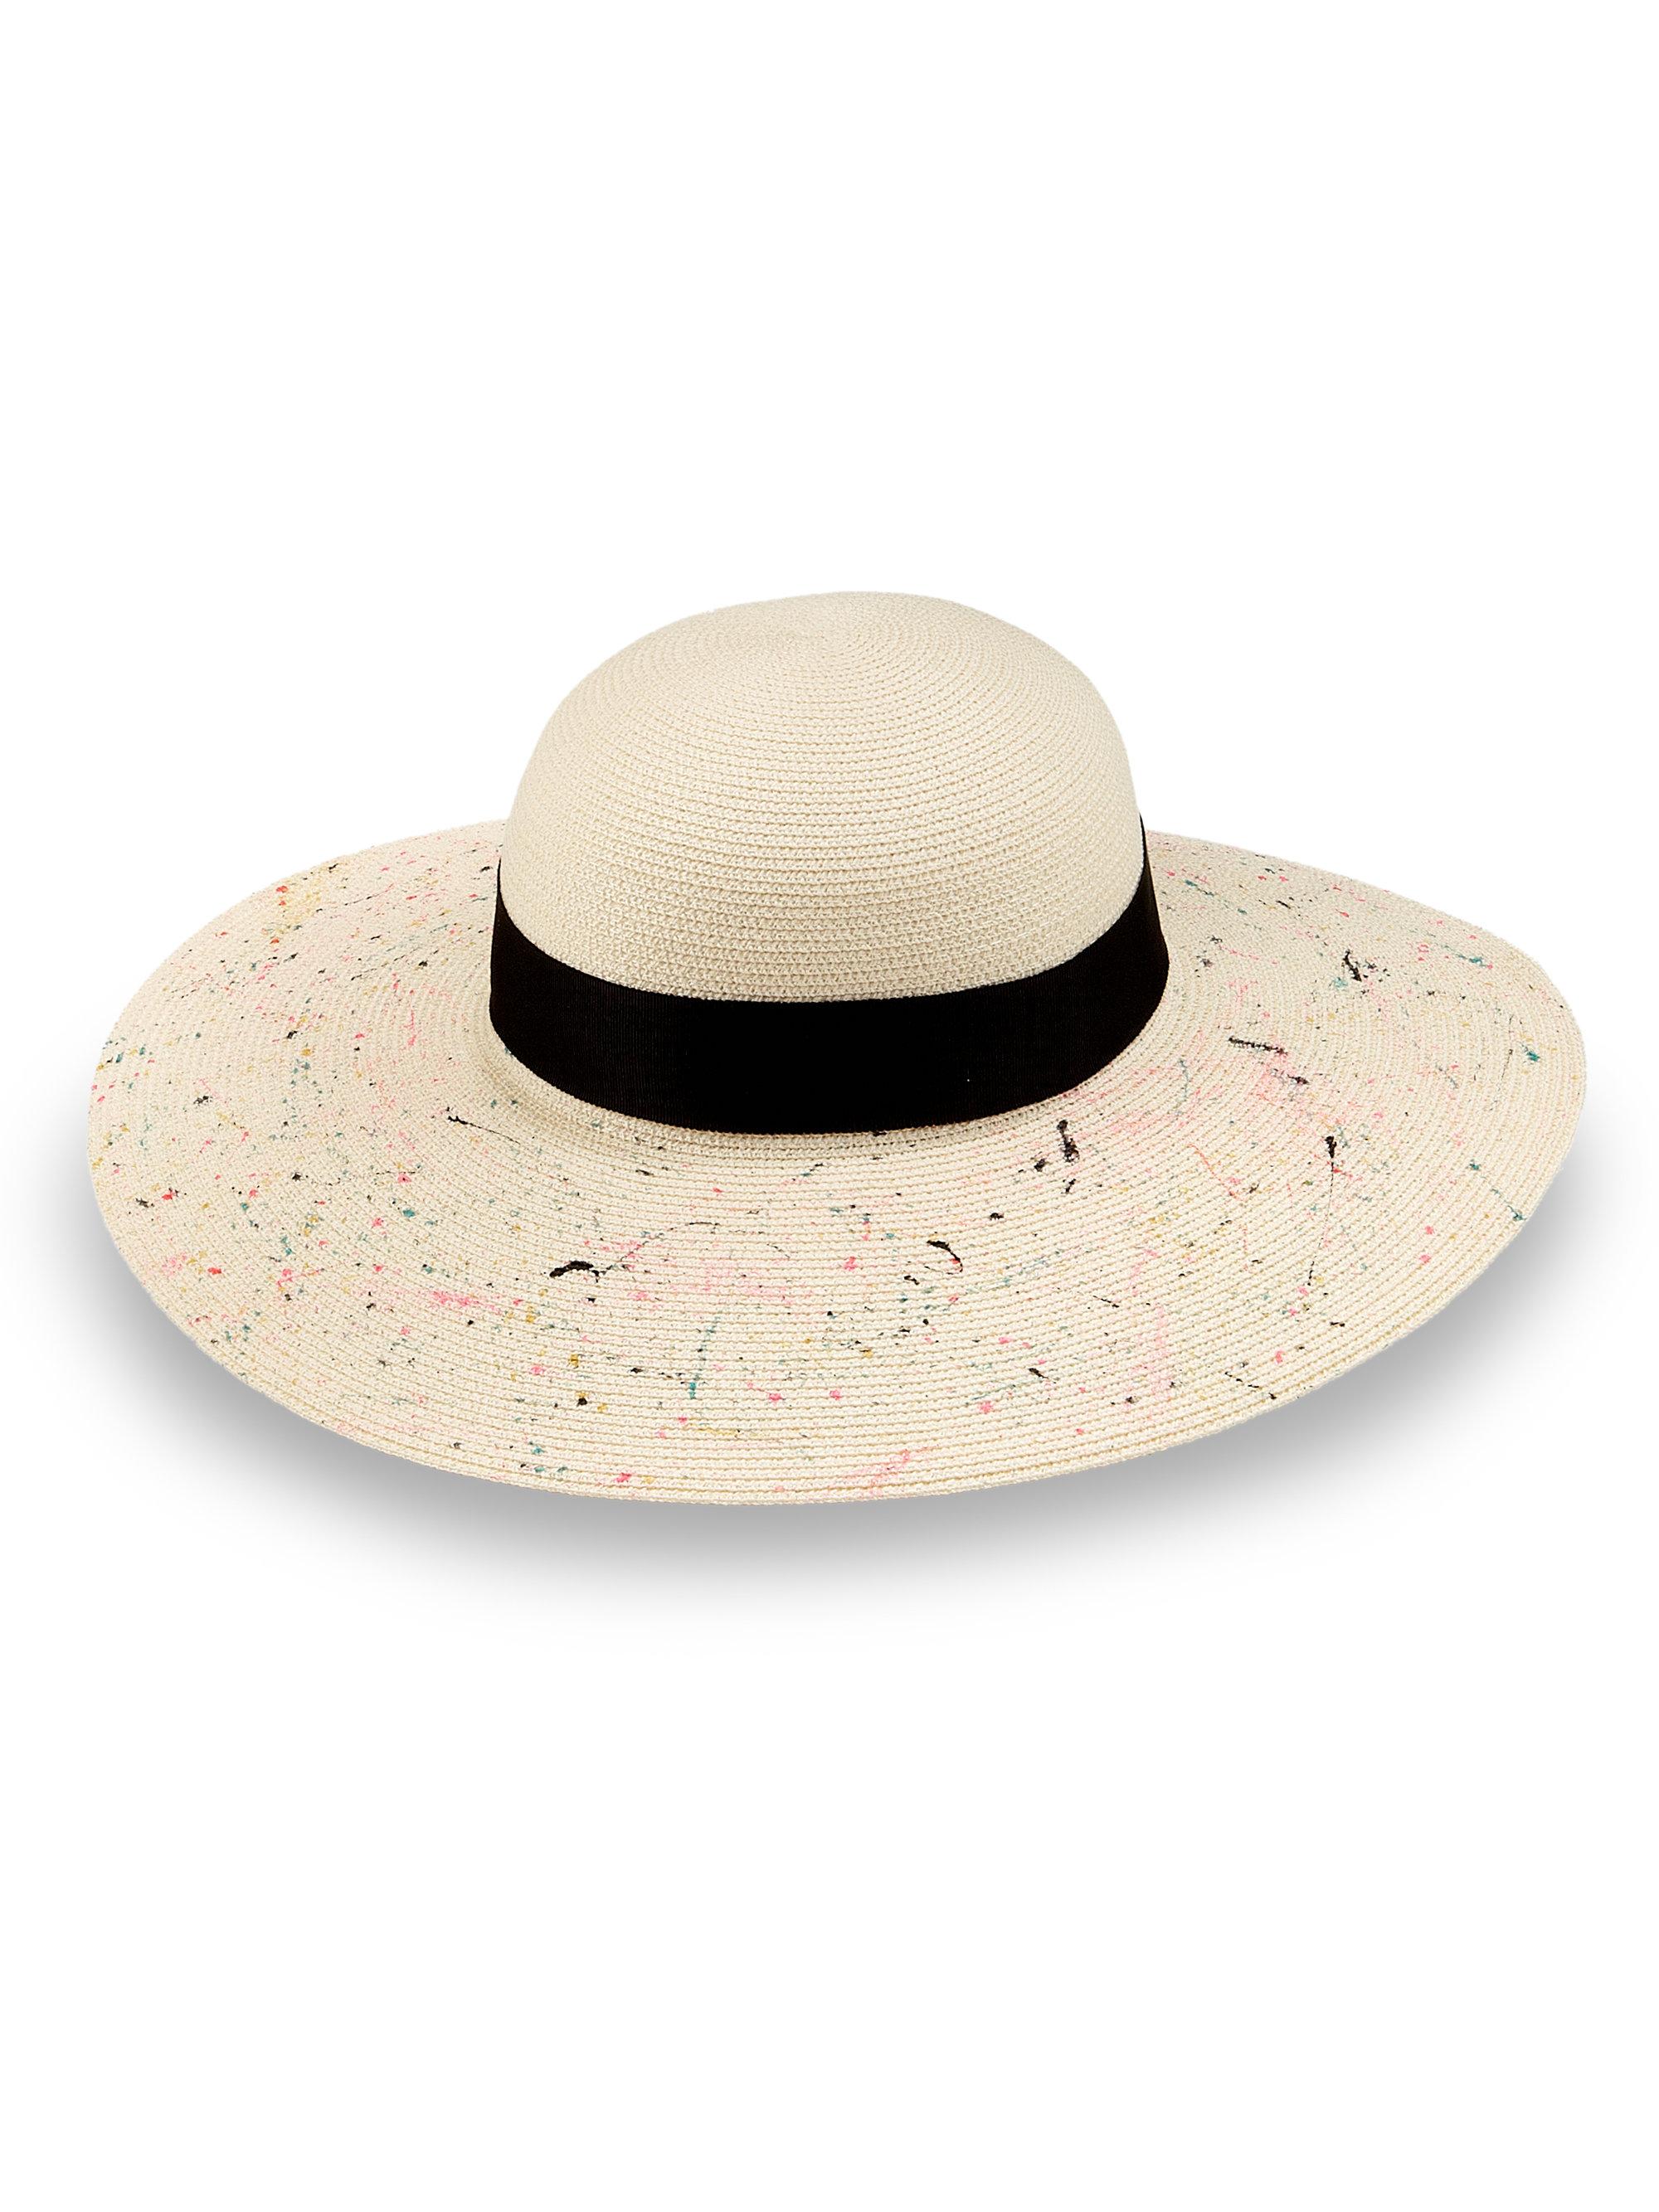 5e7447a5257b4 Eugenia Kim Honey Splatter Paint Wide-Brim Hat in White - Lyst